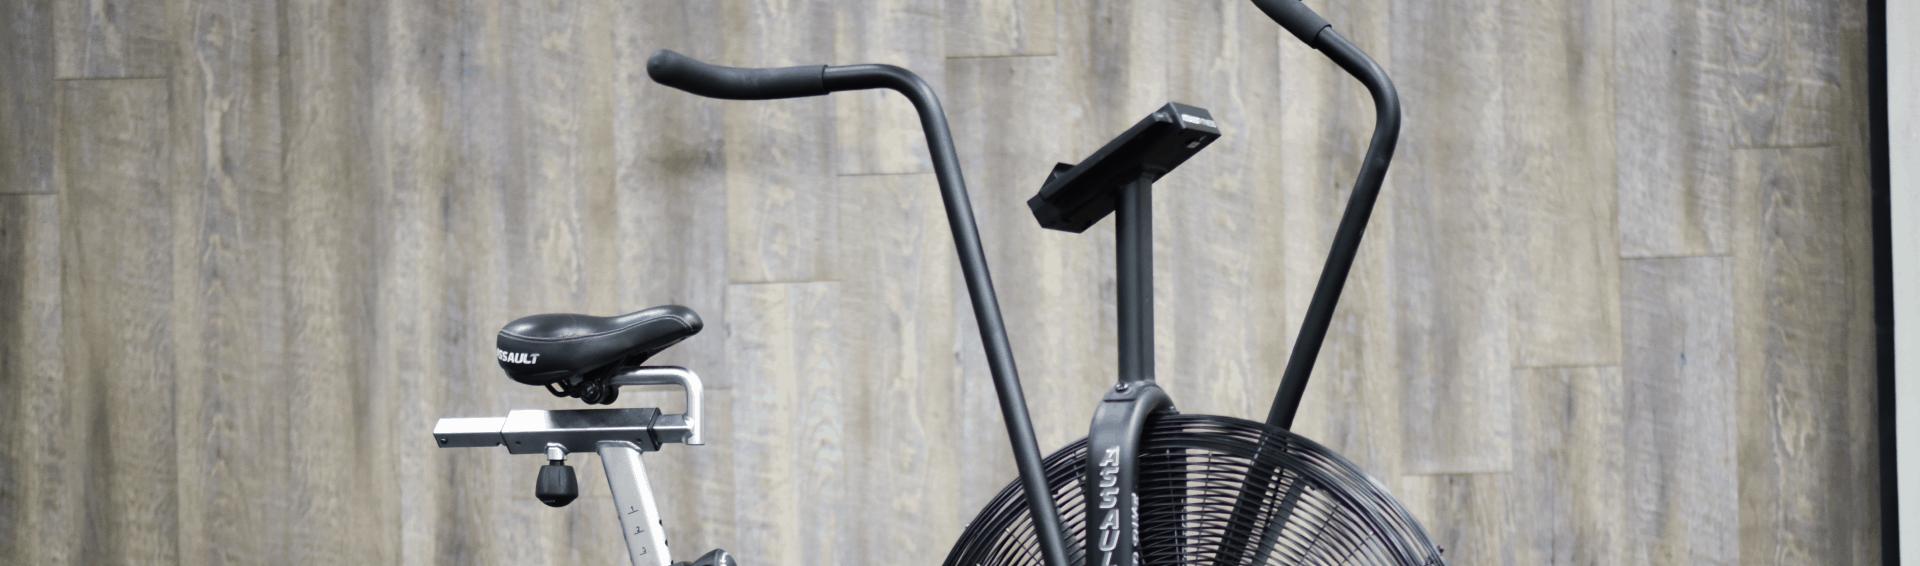 Aerobic Endurance Training for Athletes